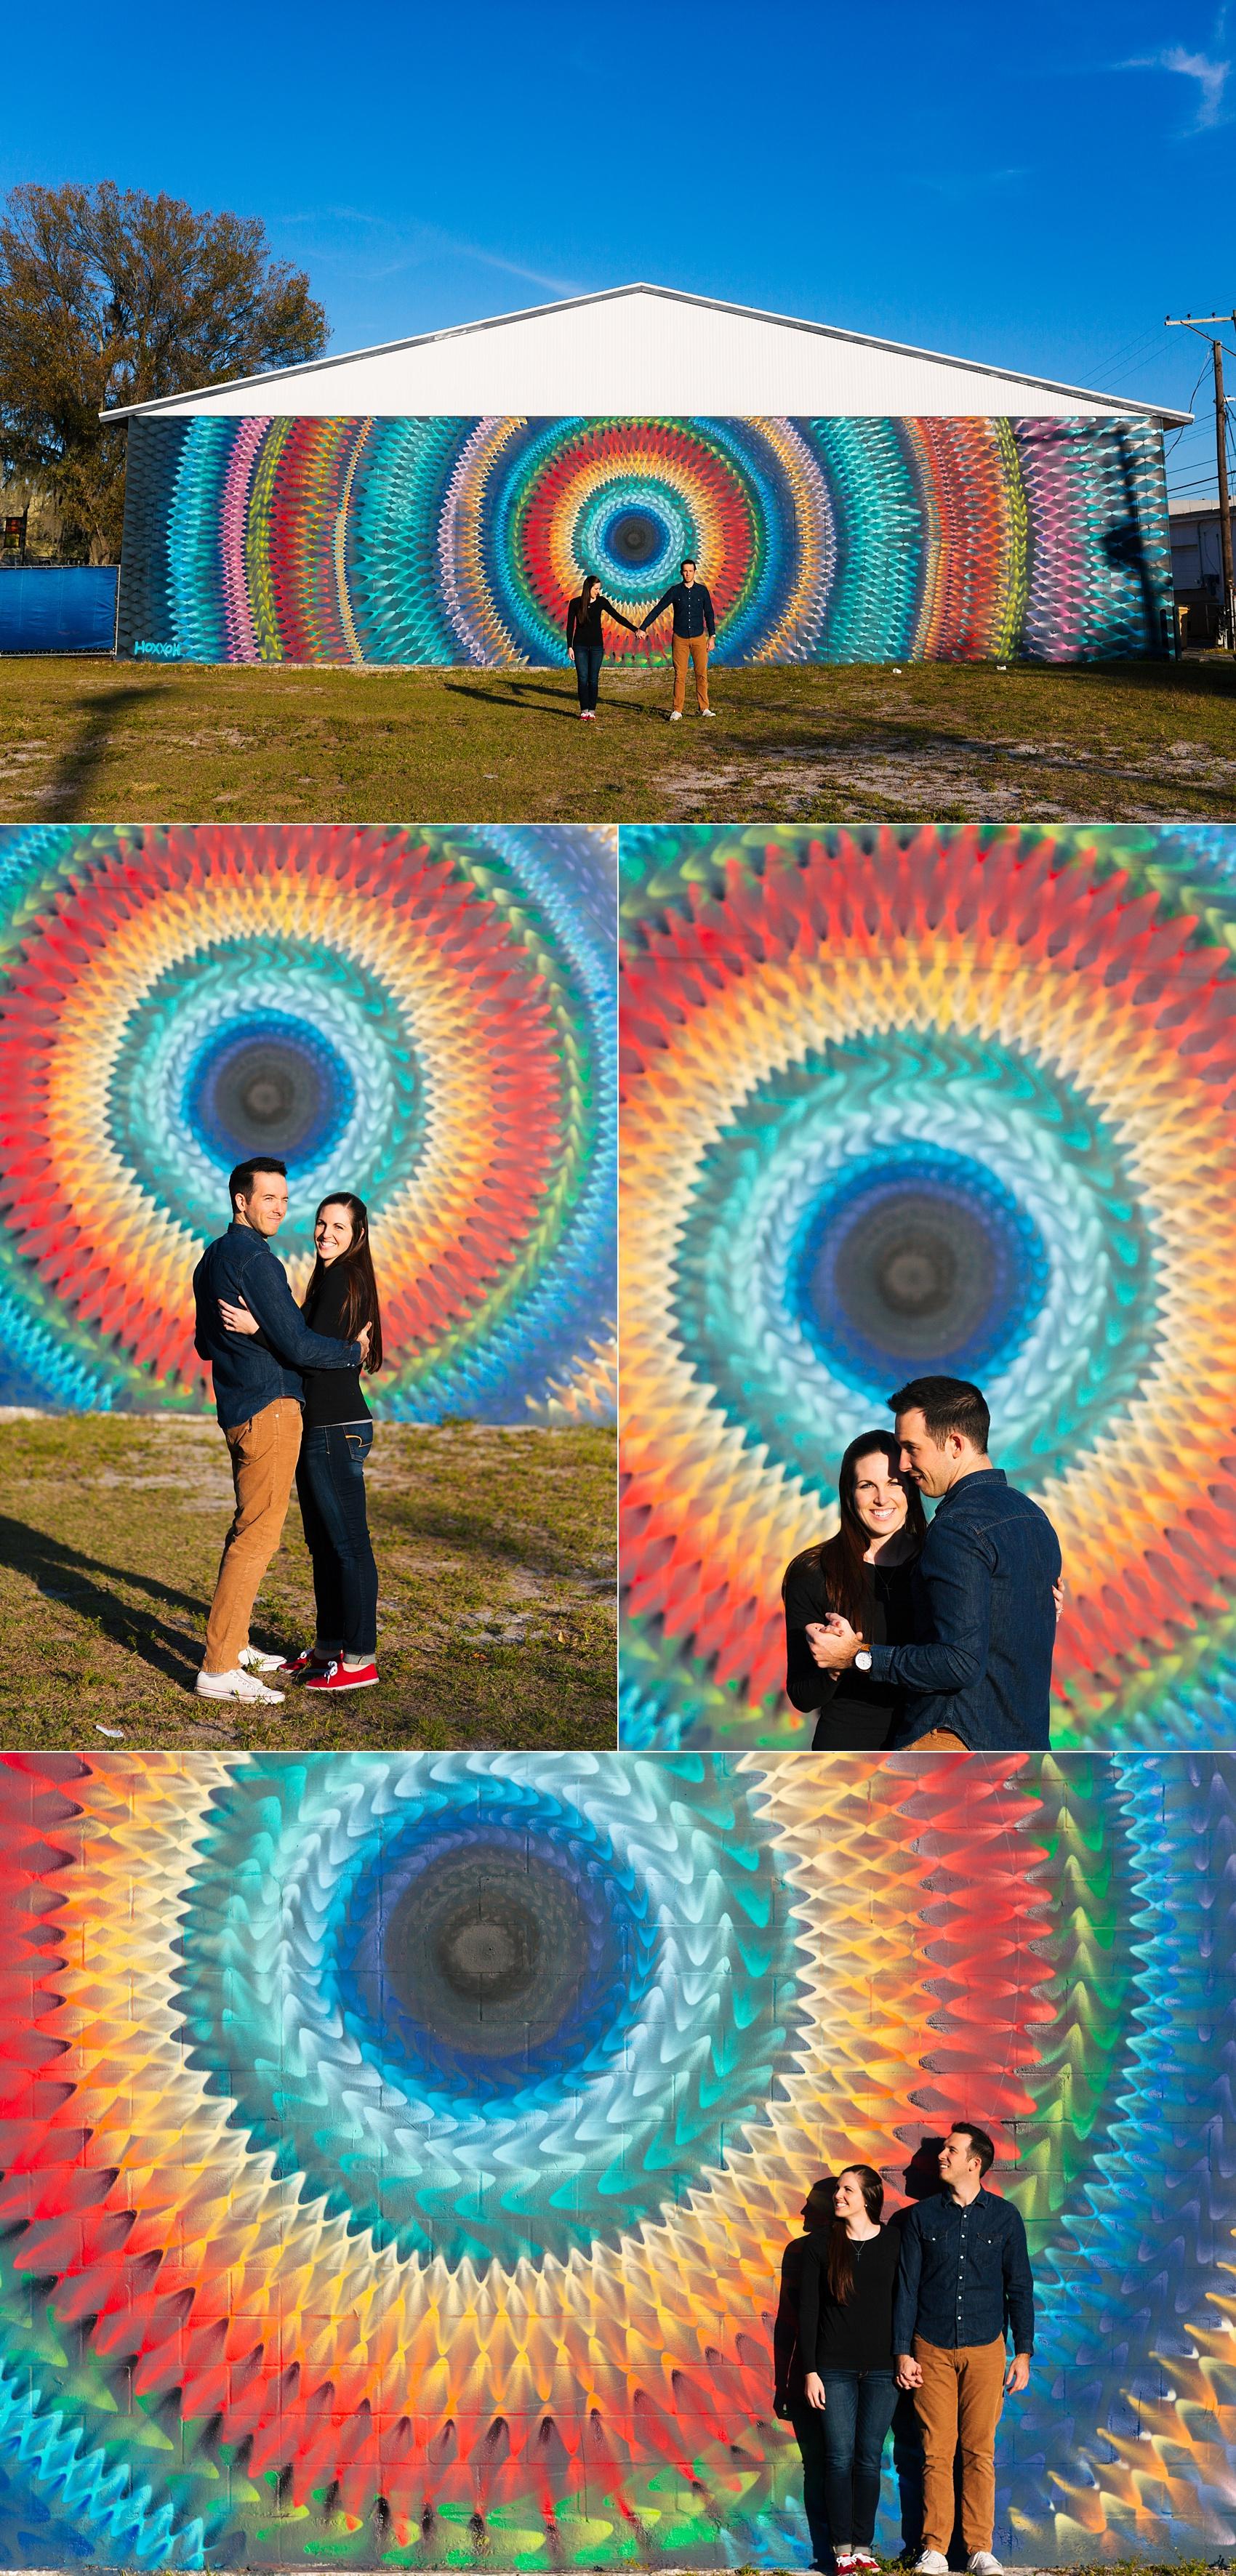 st pete mural hoxxoh engagement session steve lindsey-1